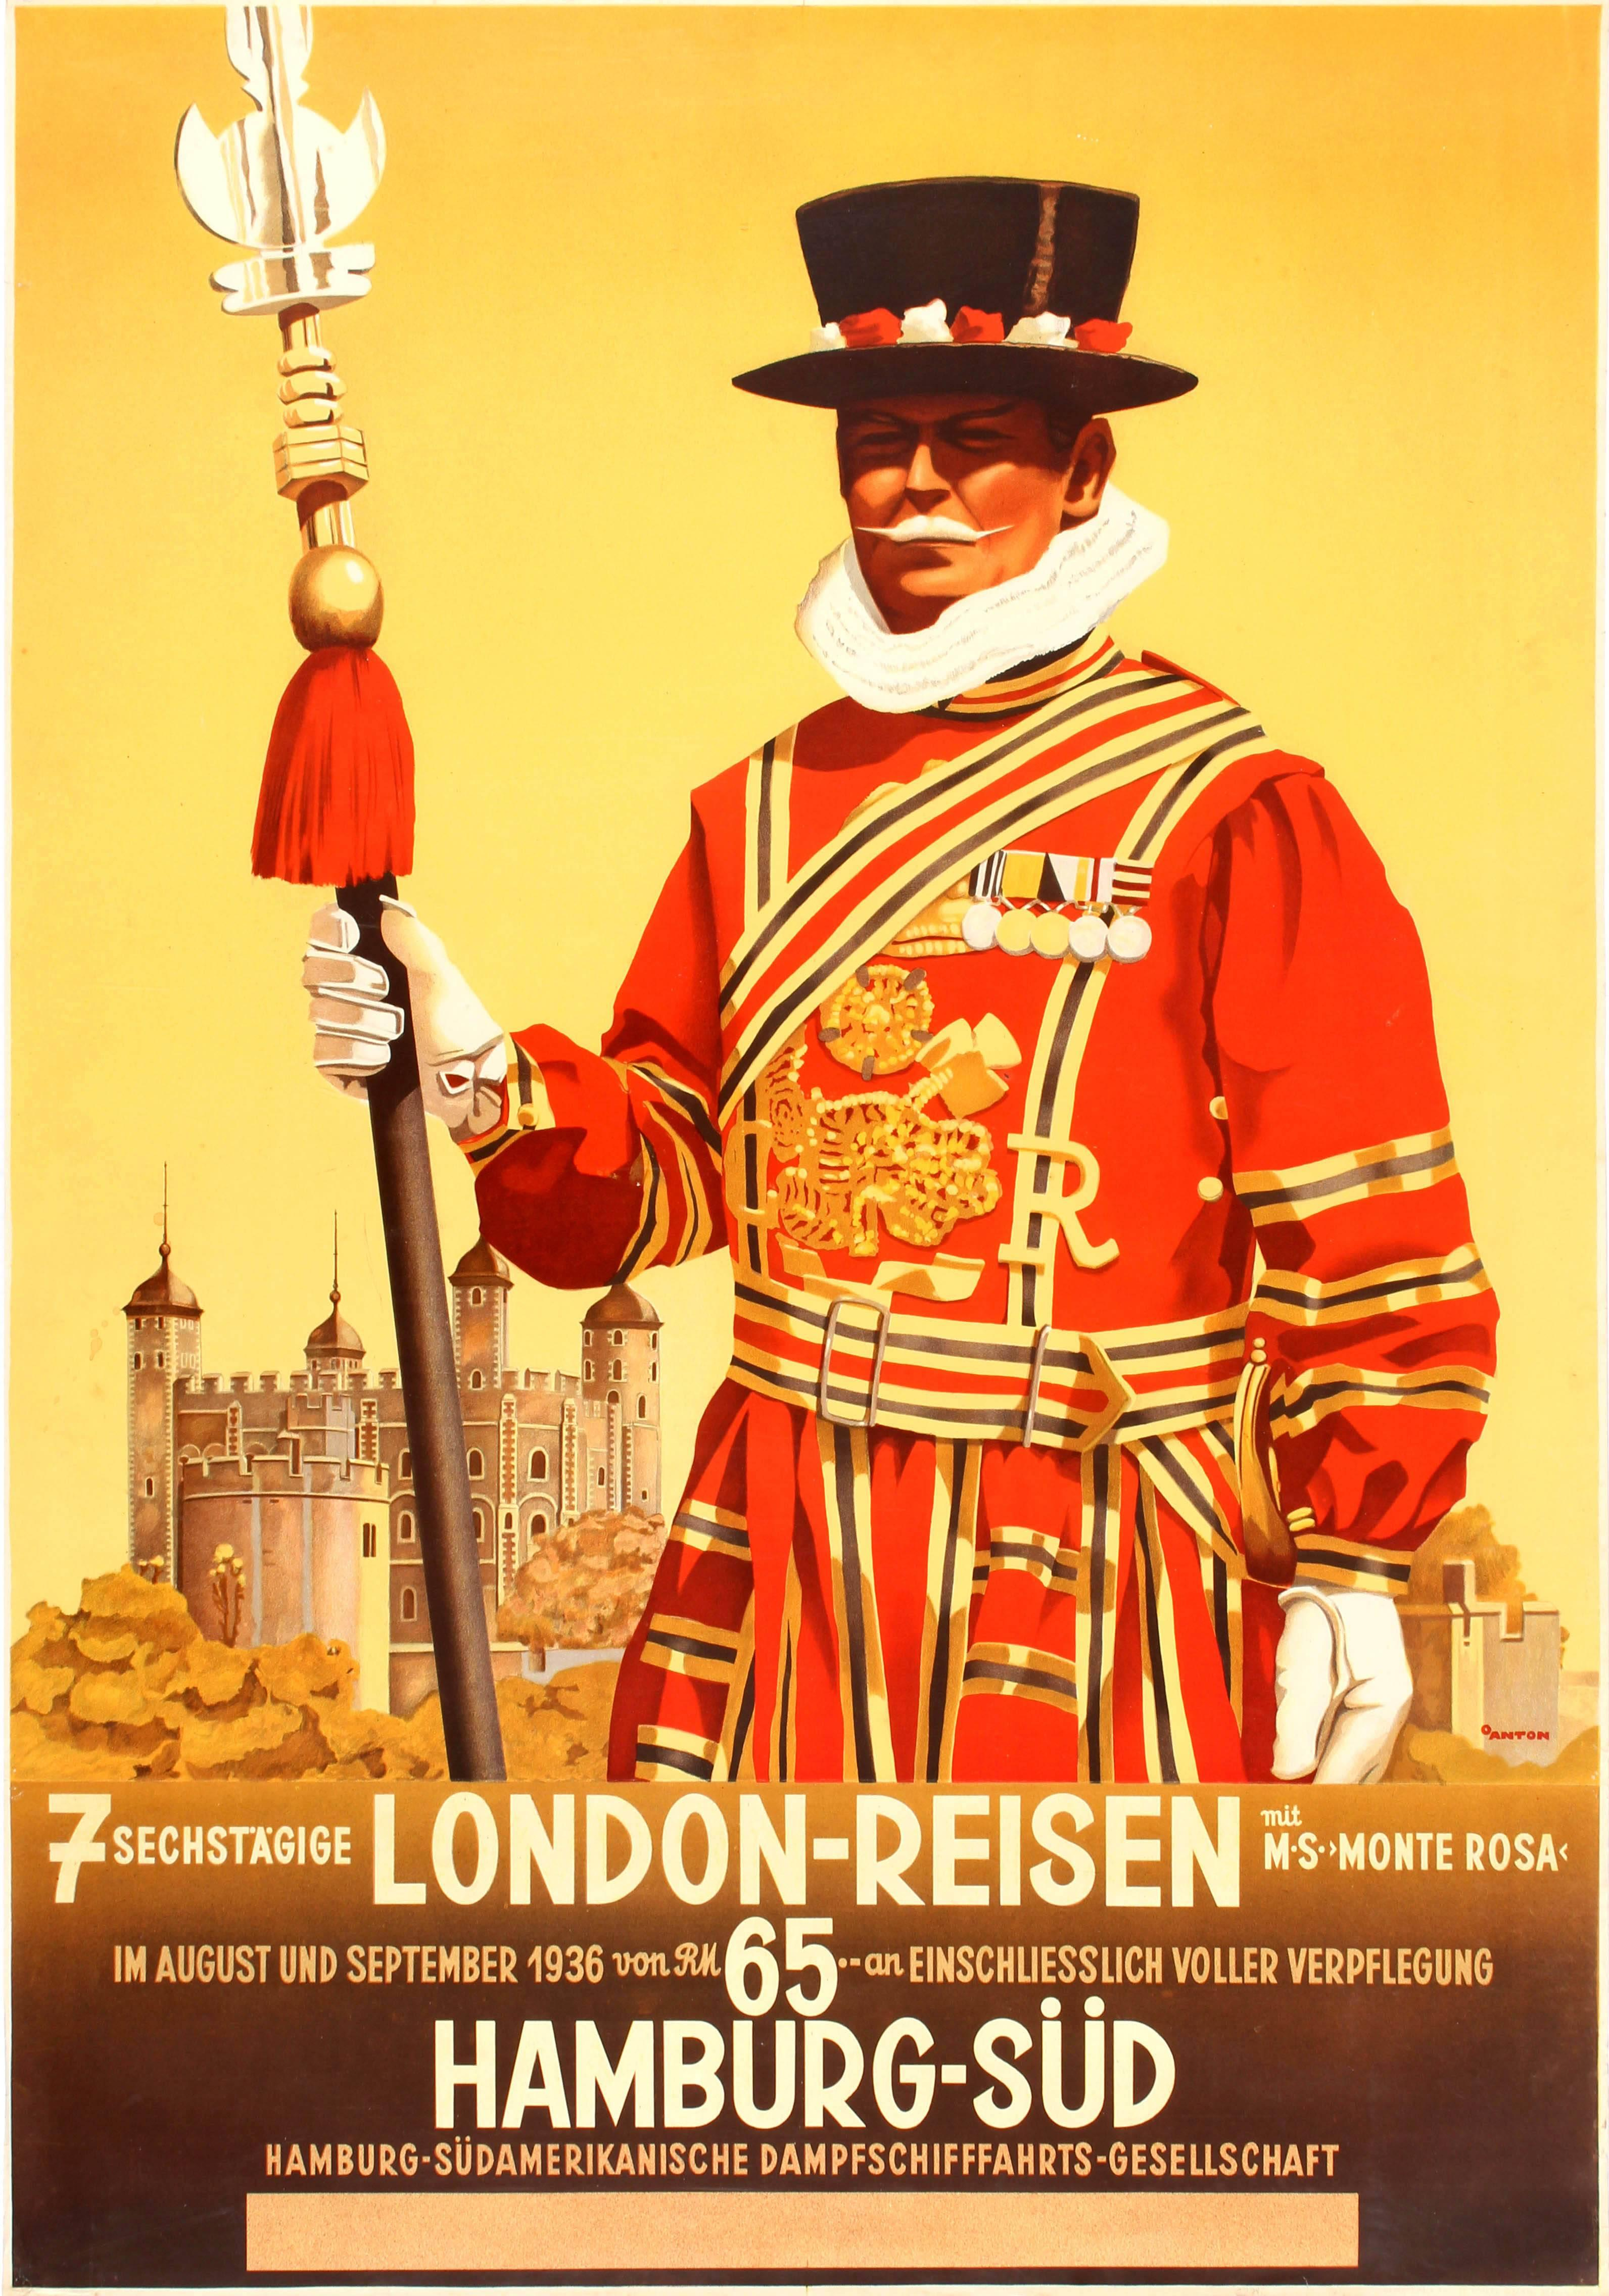 Original Vintage 1936 Travel Advertising Poster For 7 Days London By Hamburg Sud